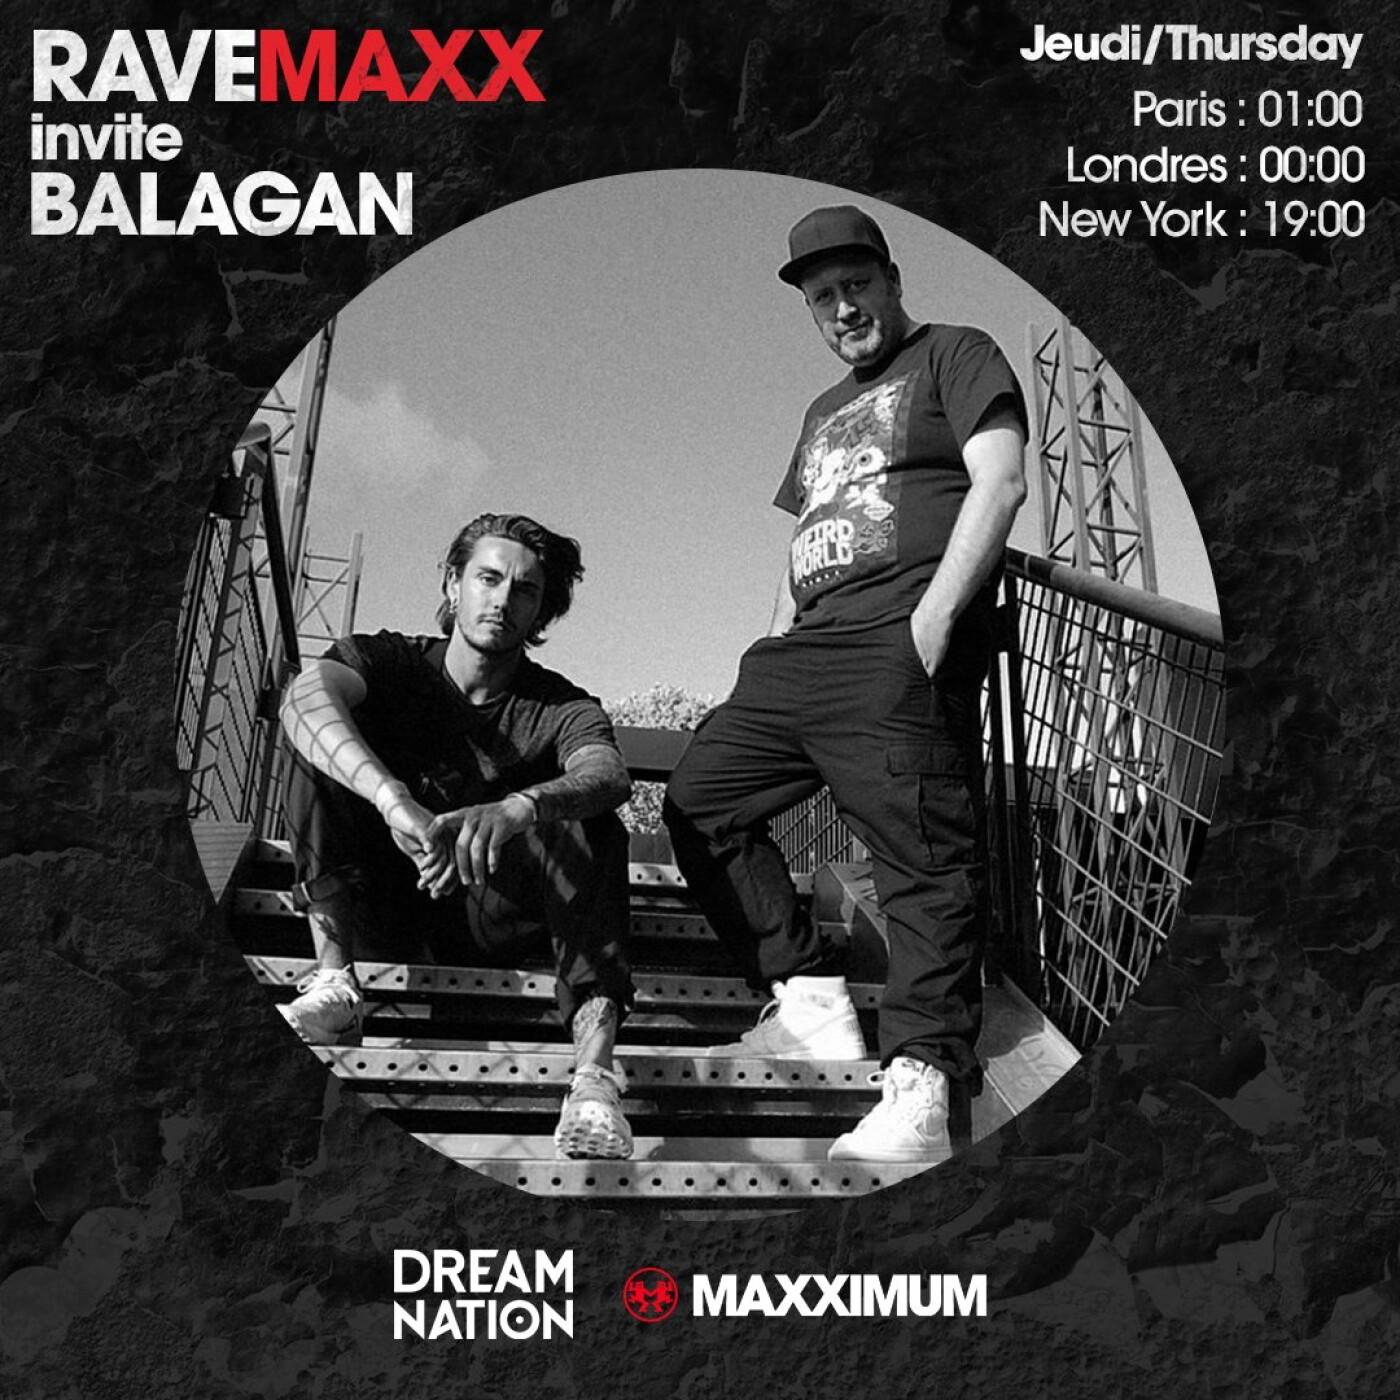 RAVEMAXX : DREAM NATION FESTIVAL AVEC BALAGAN